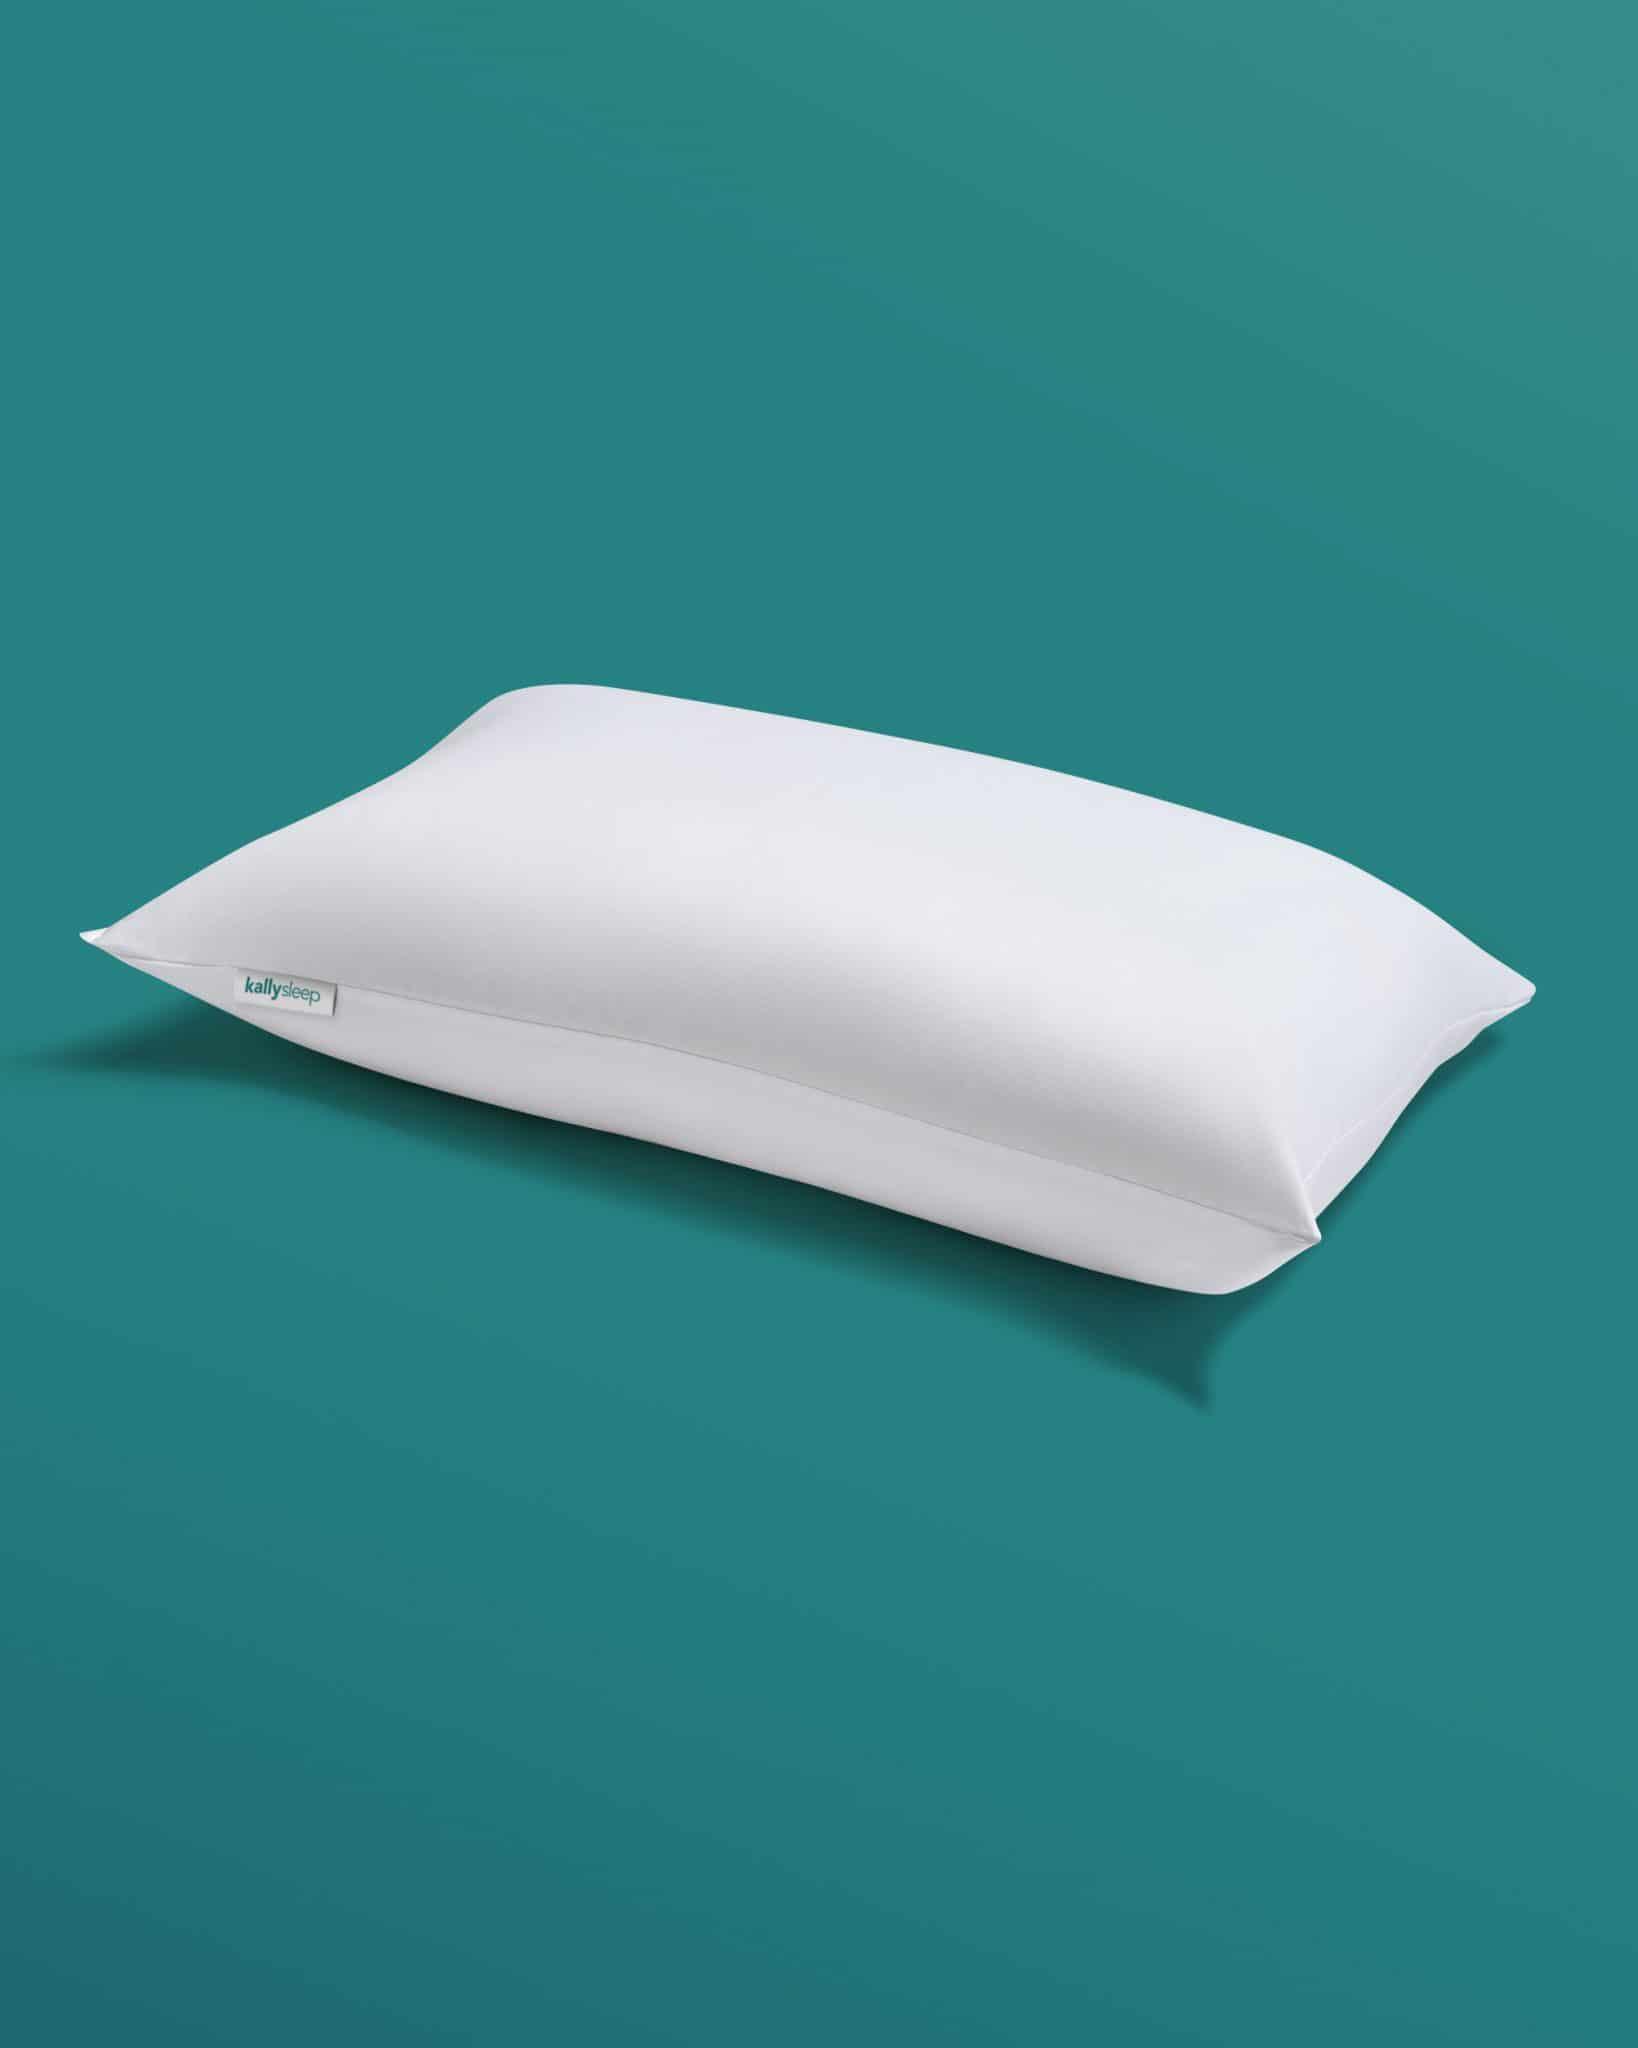 Kally Anti-Snore Pillow